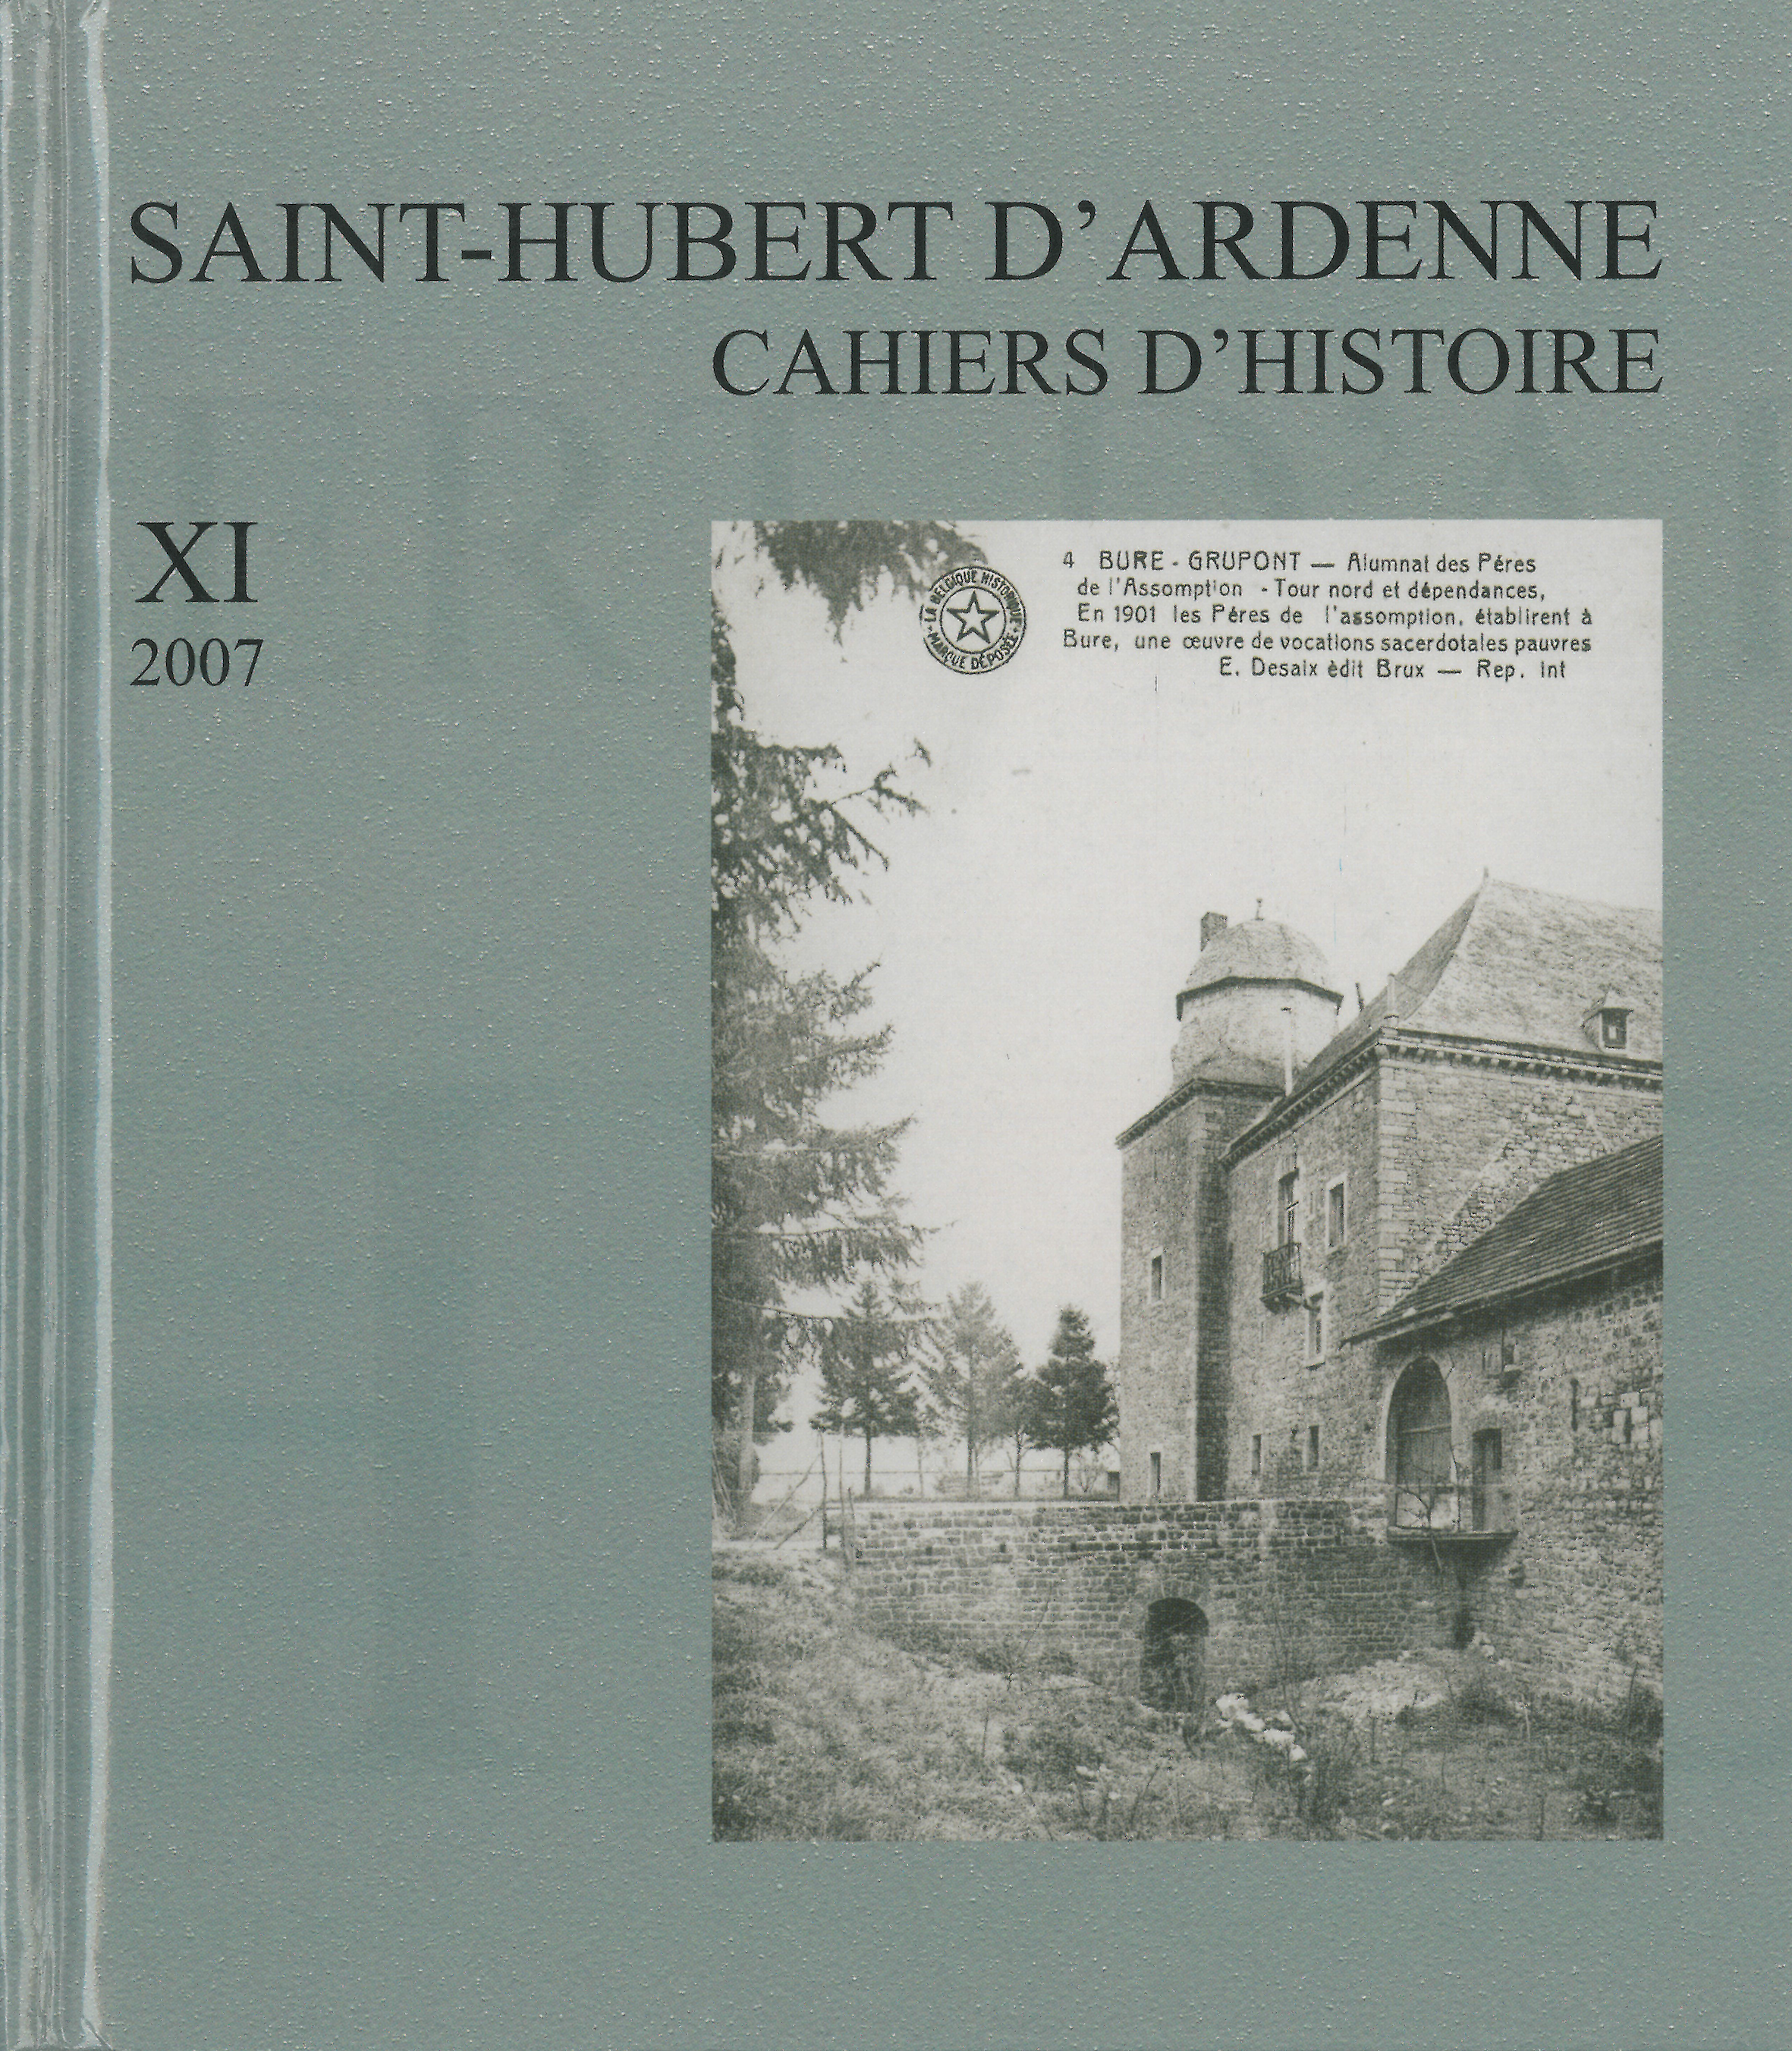 Saint-Hubert d'Ardenne – Cahiers d'histoire XI 2007